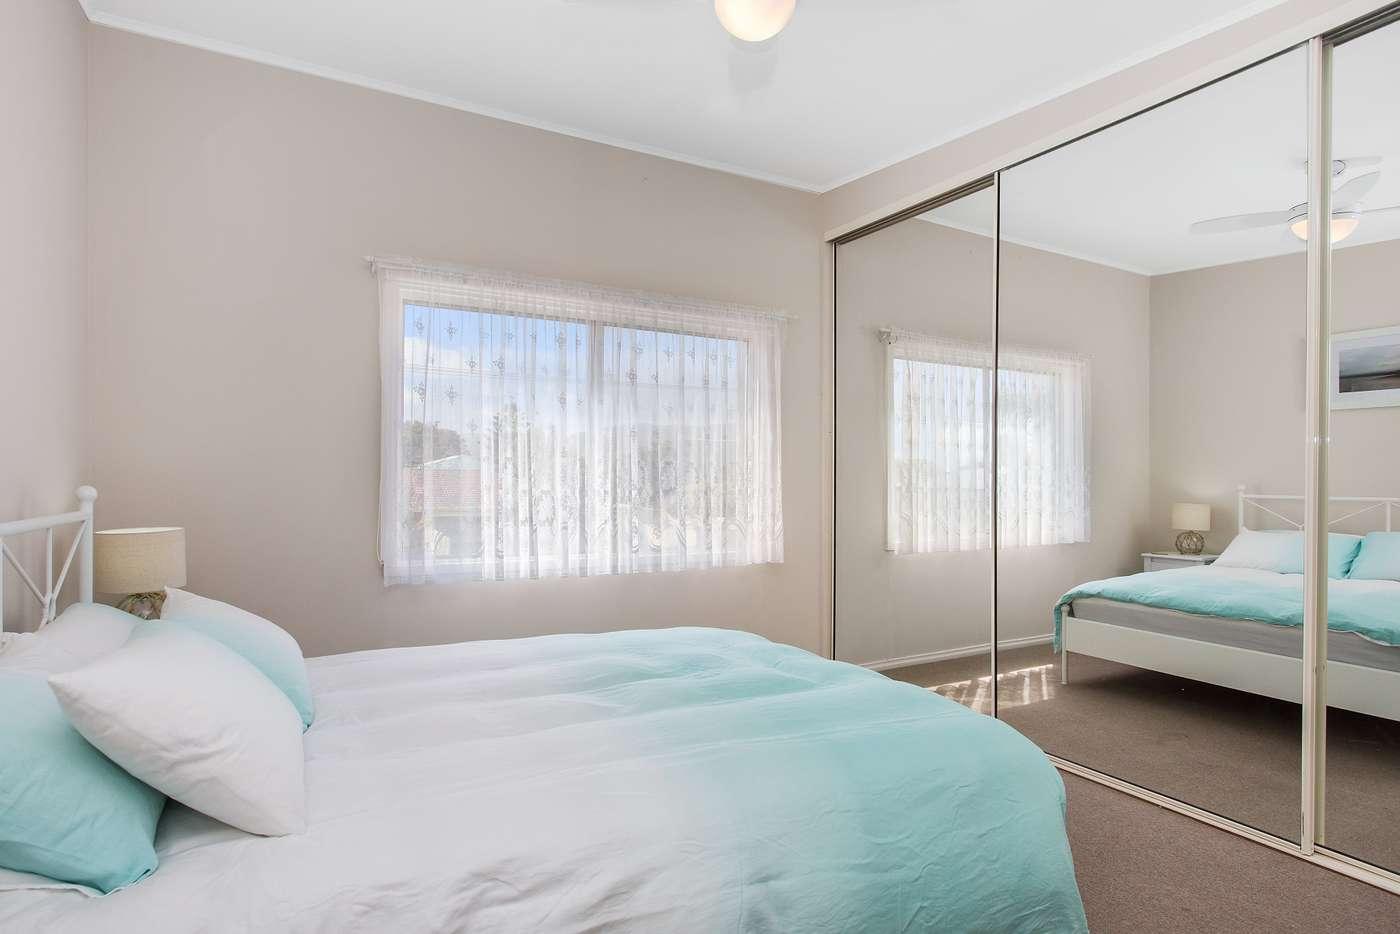 Sixth view of Homely house listing, 38 Coolangatta Drive, Aldinga Beach SA 5173